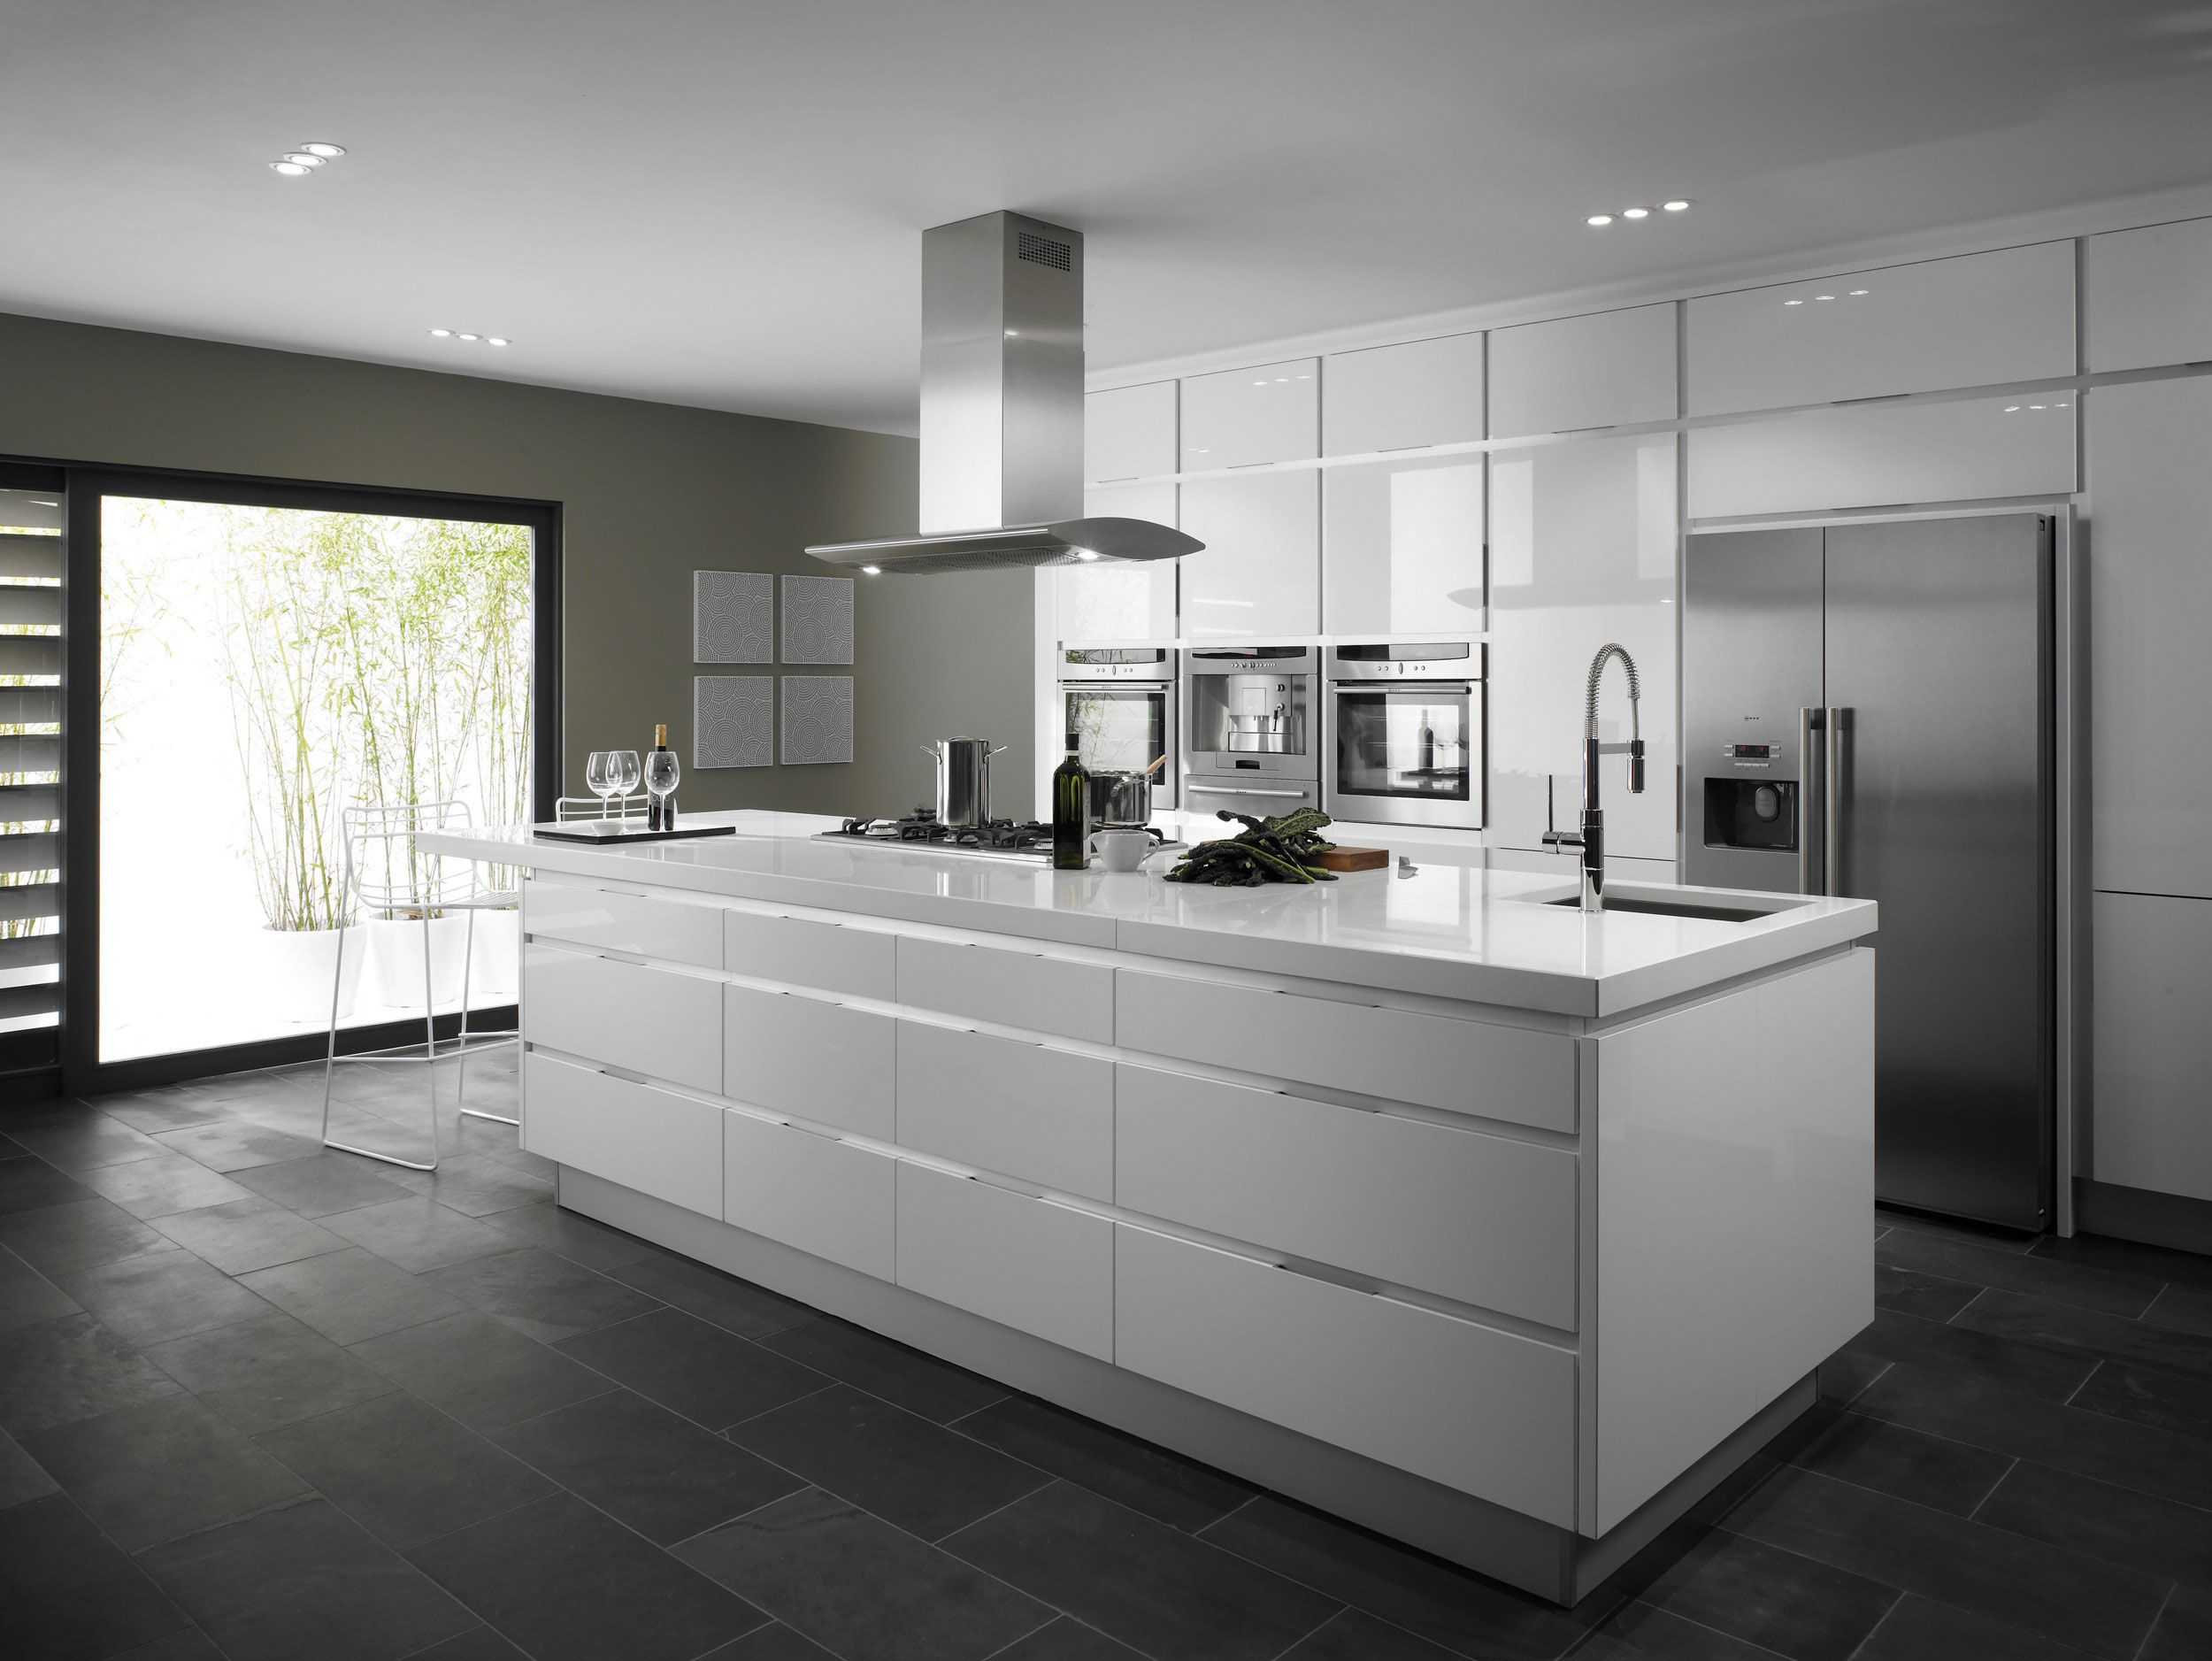 Design Inspiration Freestanding Kitchen Islands: Kitchen Decoration Fashionable Chrome Free Standing Range